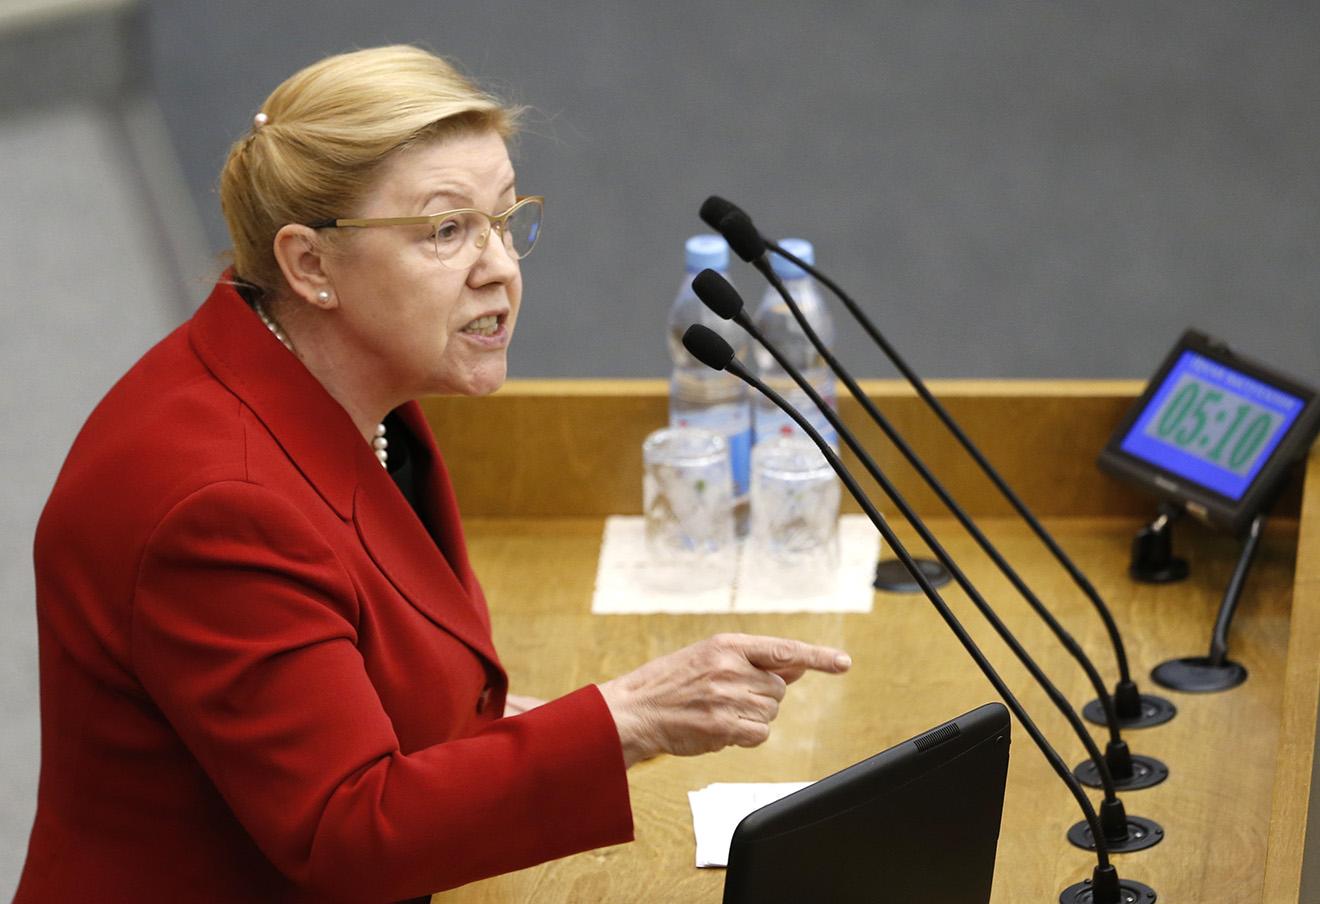 Елена Мизулина. Фото: Джапаридзе Михаил / ТАСС